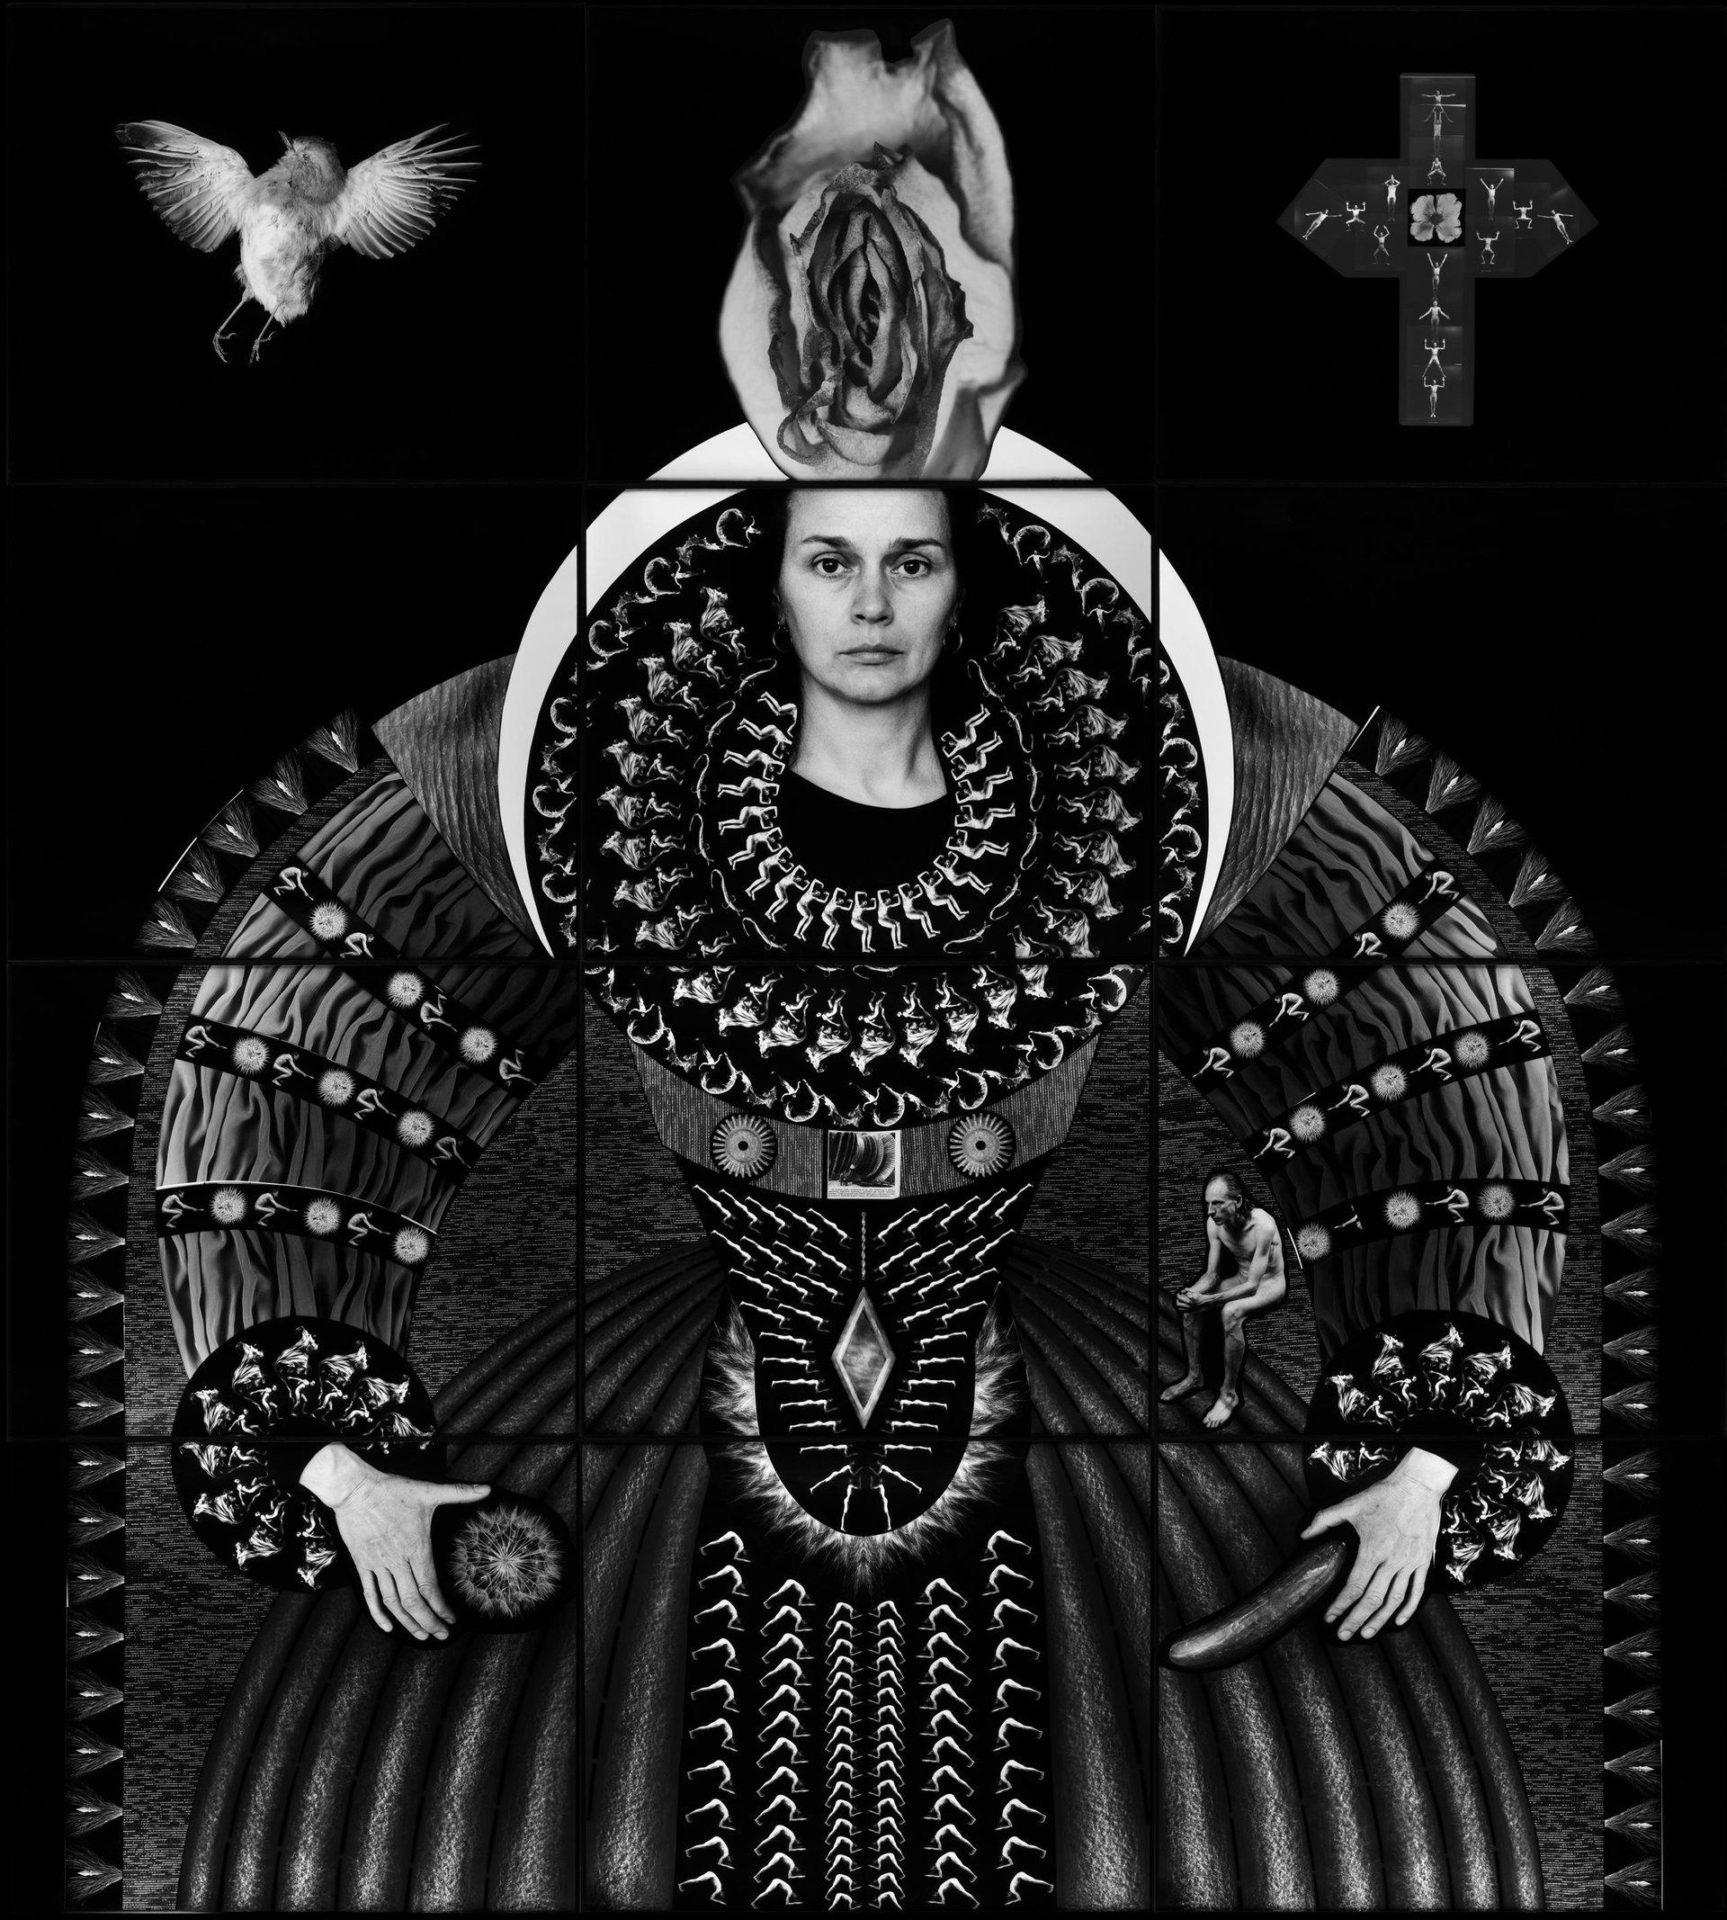 Zofia Kulik, The Splendour of Myself IV, 2007